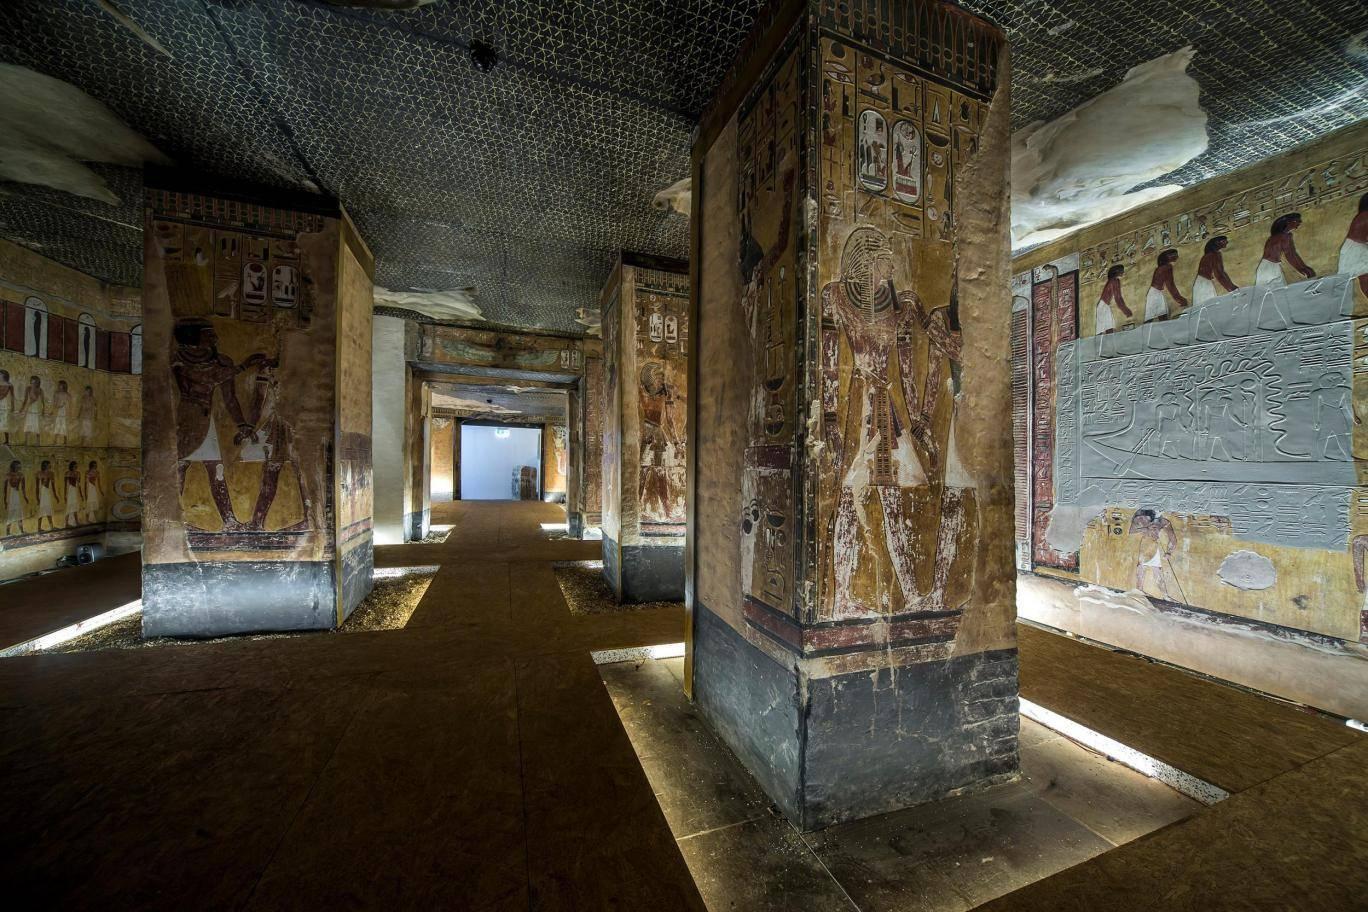 Ancient Egyptian tomb resurrected using 3D printer https://t.co/9Z9ITwFtZg https://t.co/8B6pmqw93L